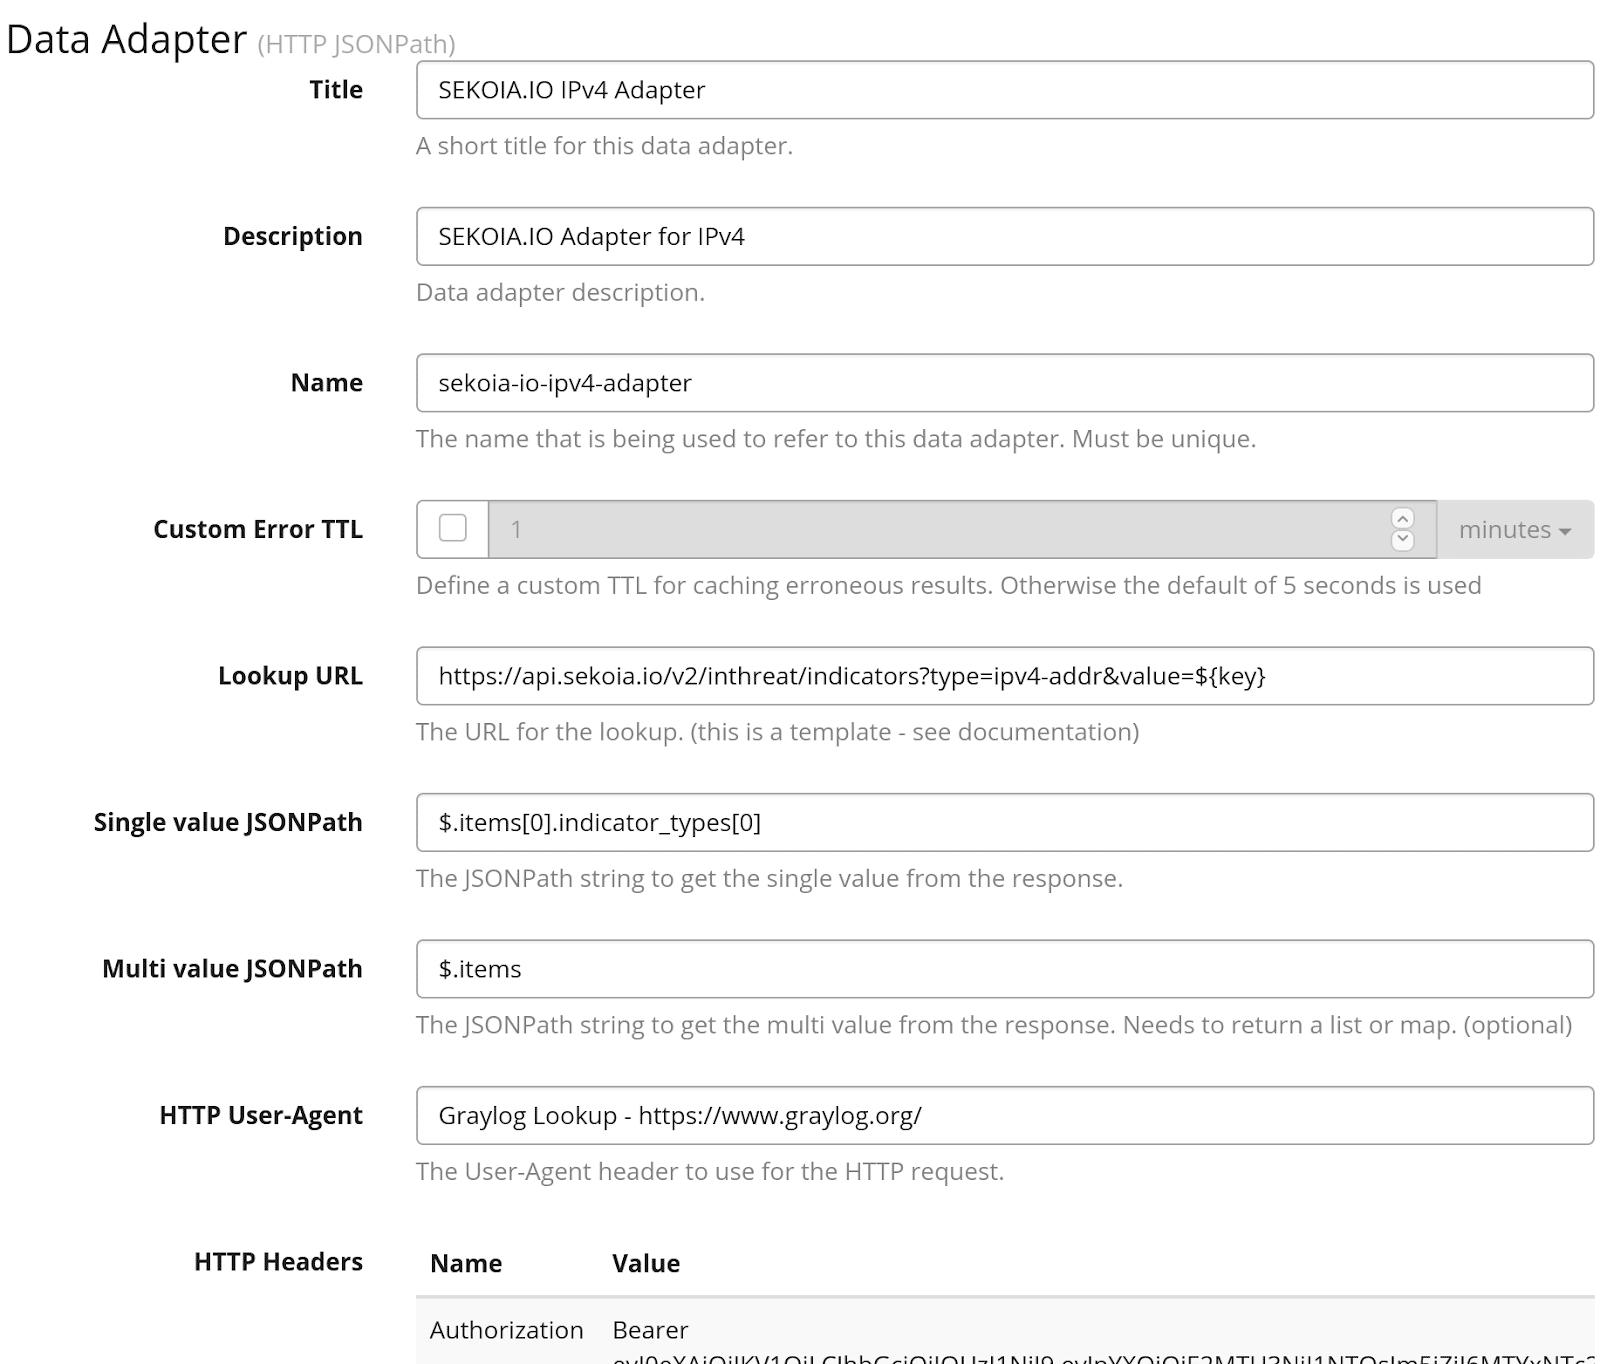 SEKOIA.IO IPv4 Adaptater